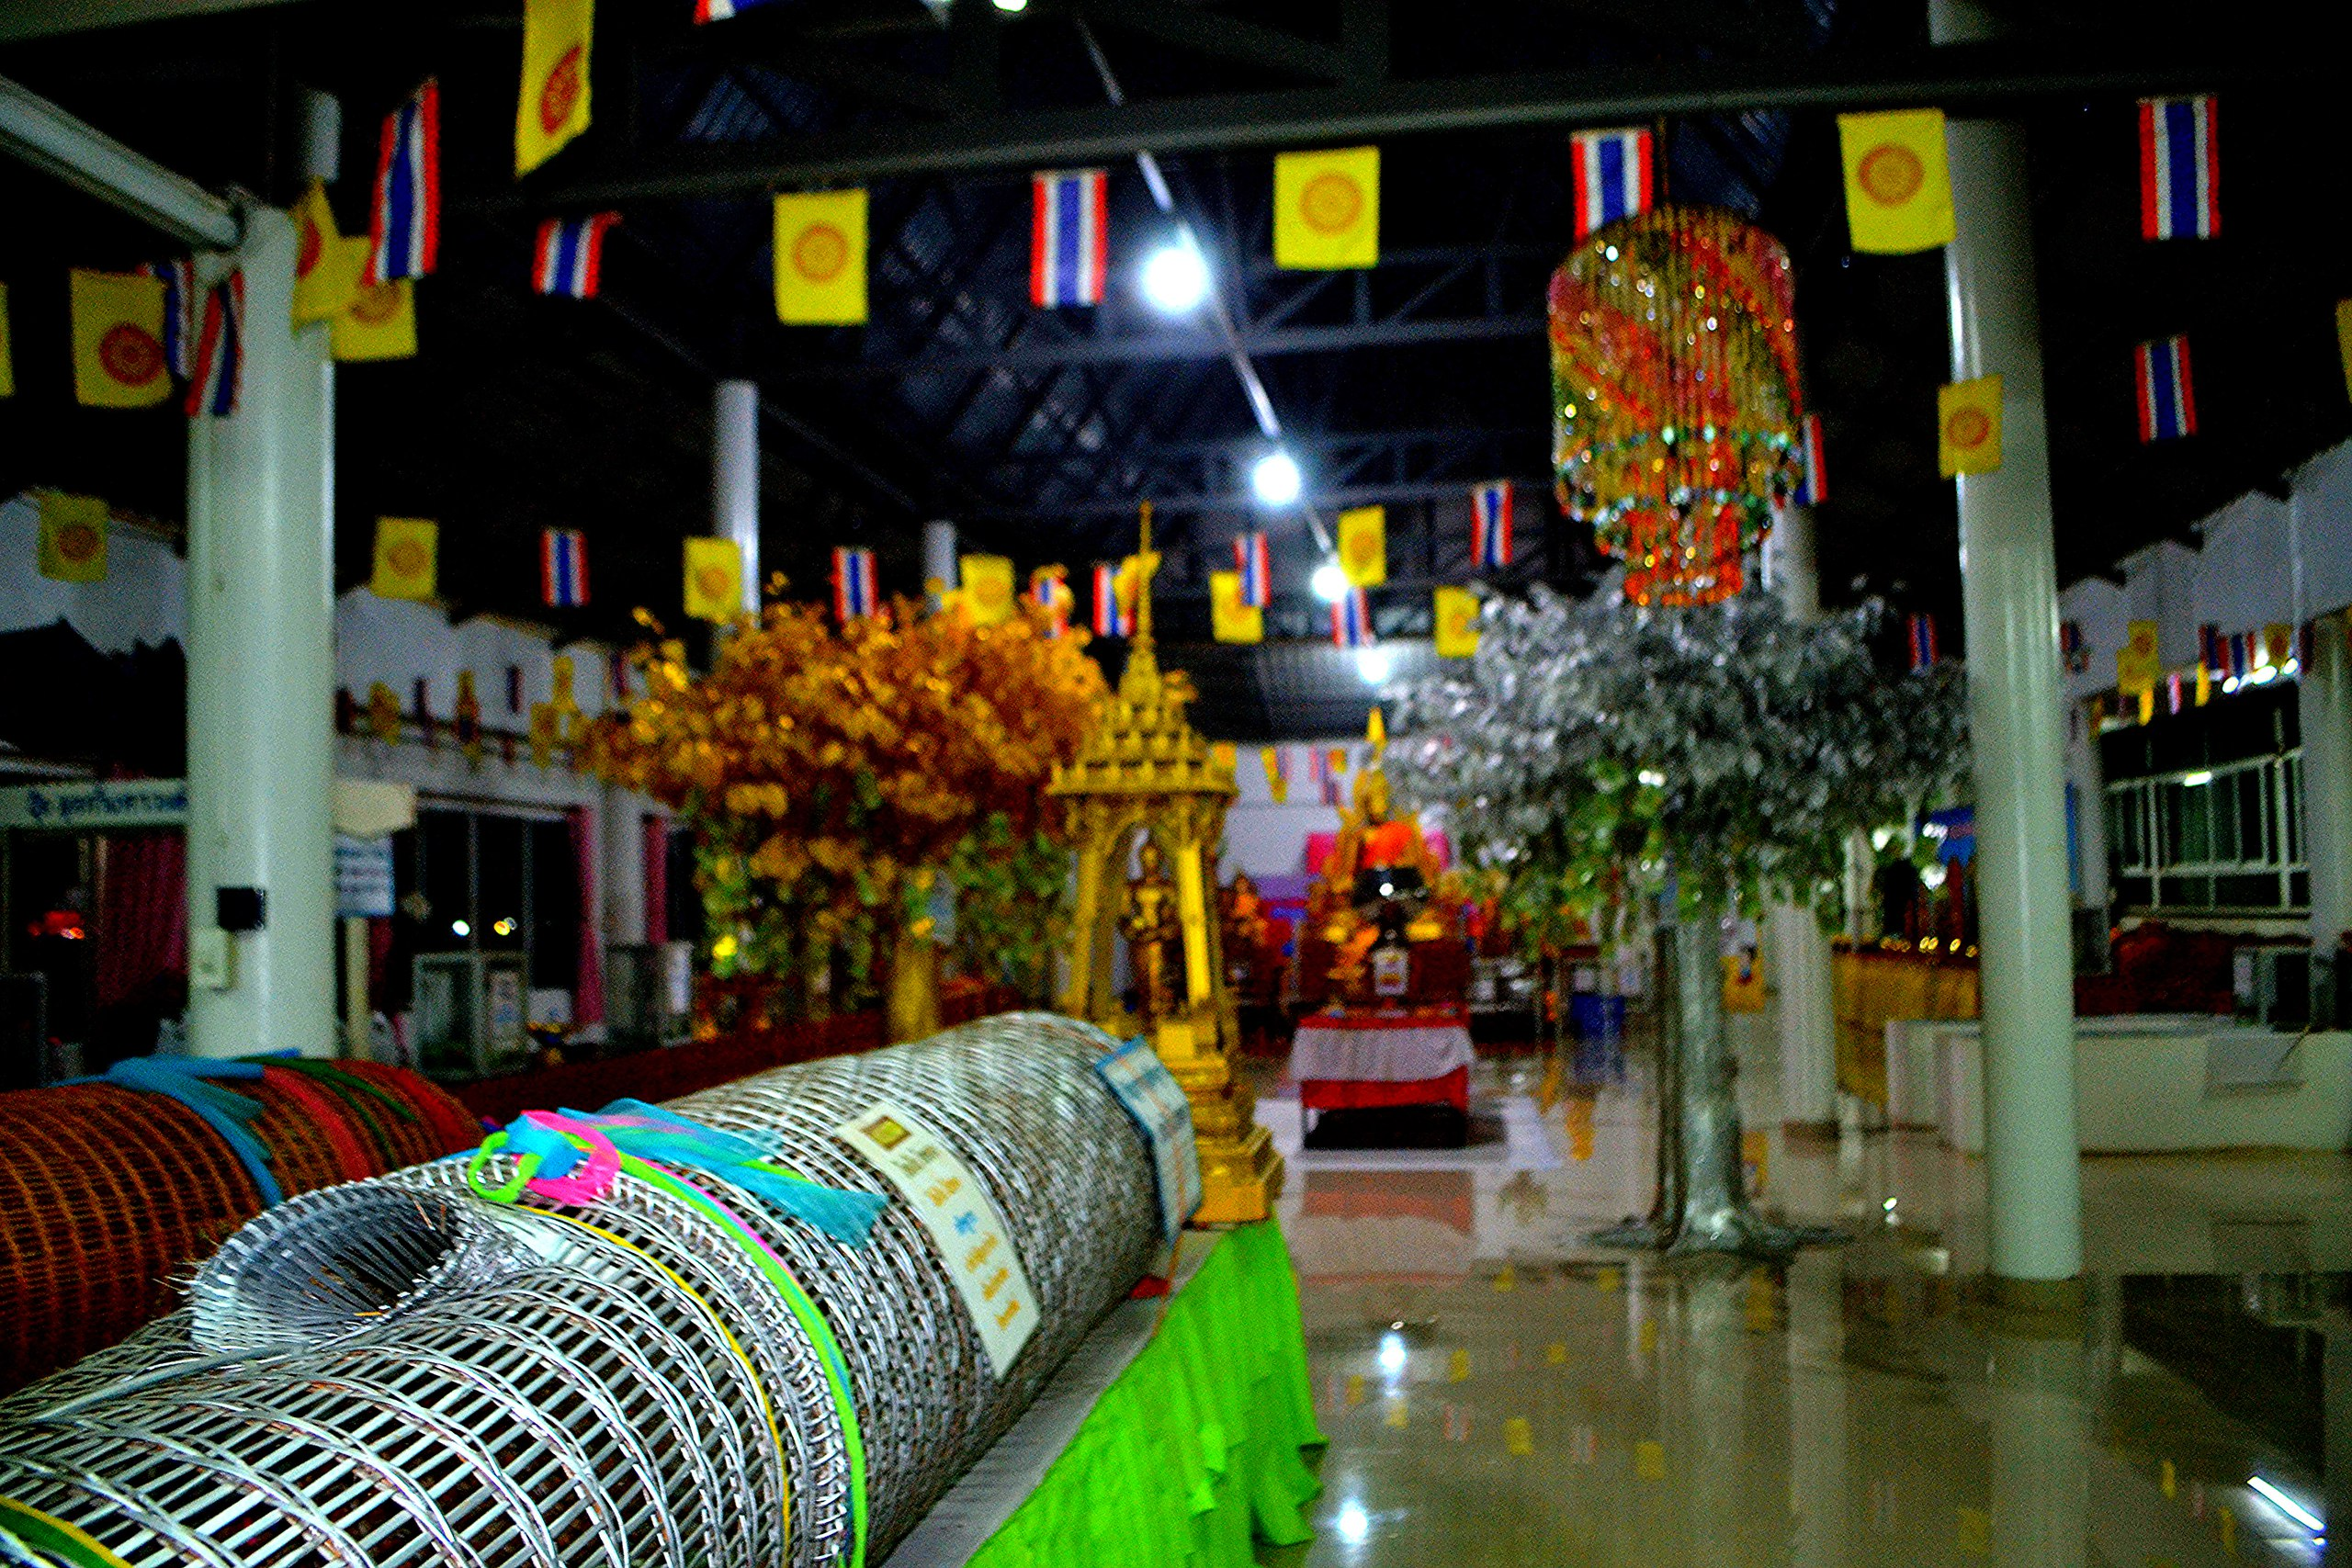 Елена Руденко (Валтея). Таиланд. Таиланд. Paтчaбуpи: Пещера страха, Пещера мышей, Буддийский храм GWKjHq5RA2g